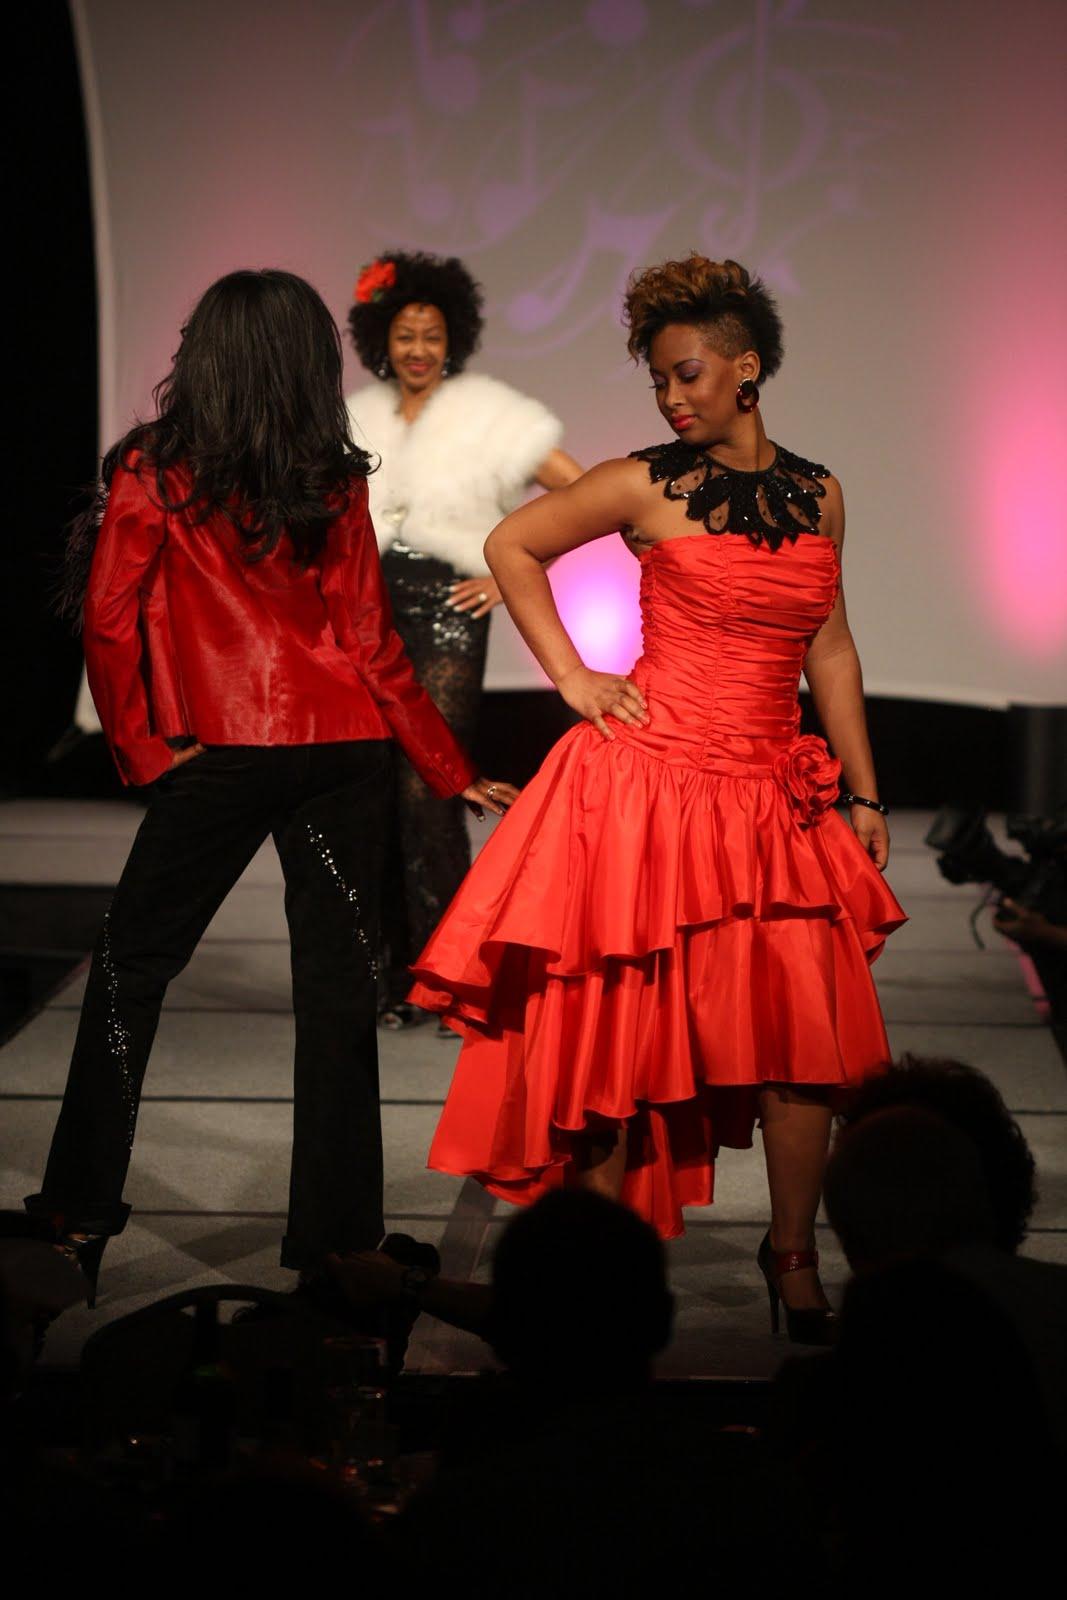 http://2.bp.blogspot.com/_8sEE3QQ02E8/TNR230J0RVI/AAAAAAAABTk/8WlJhs-A0CE/s1600/Pointer_Sisters_2.JPG